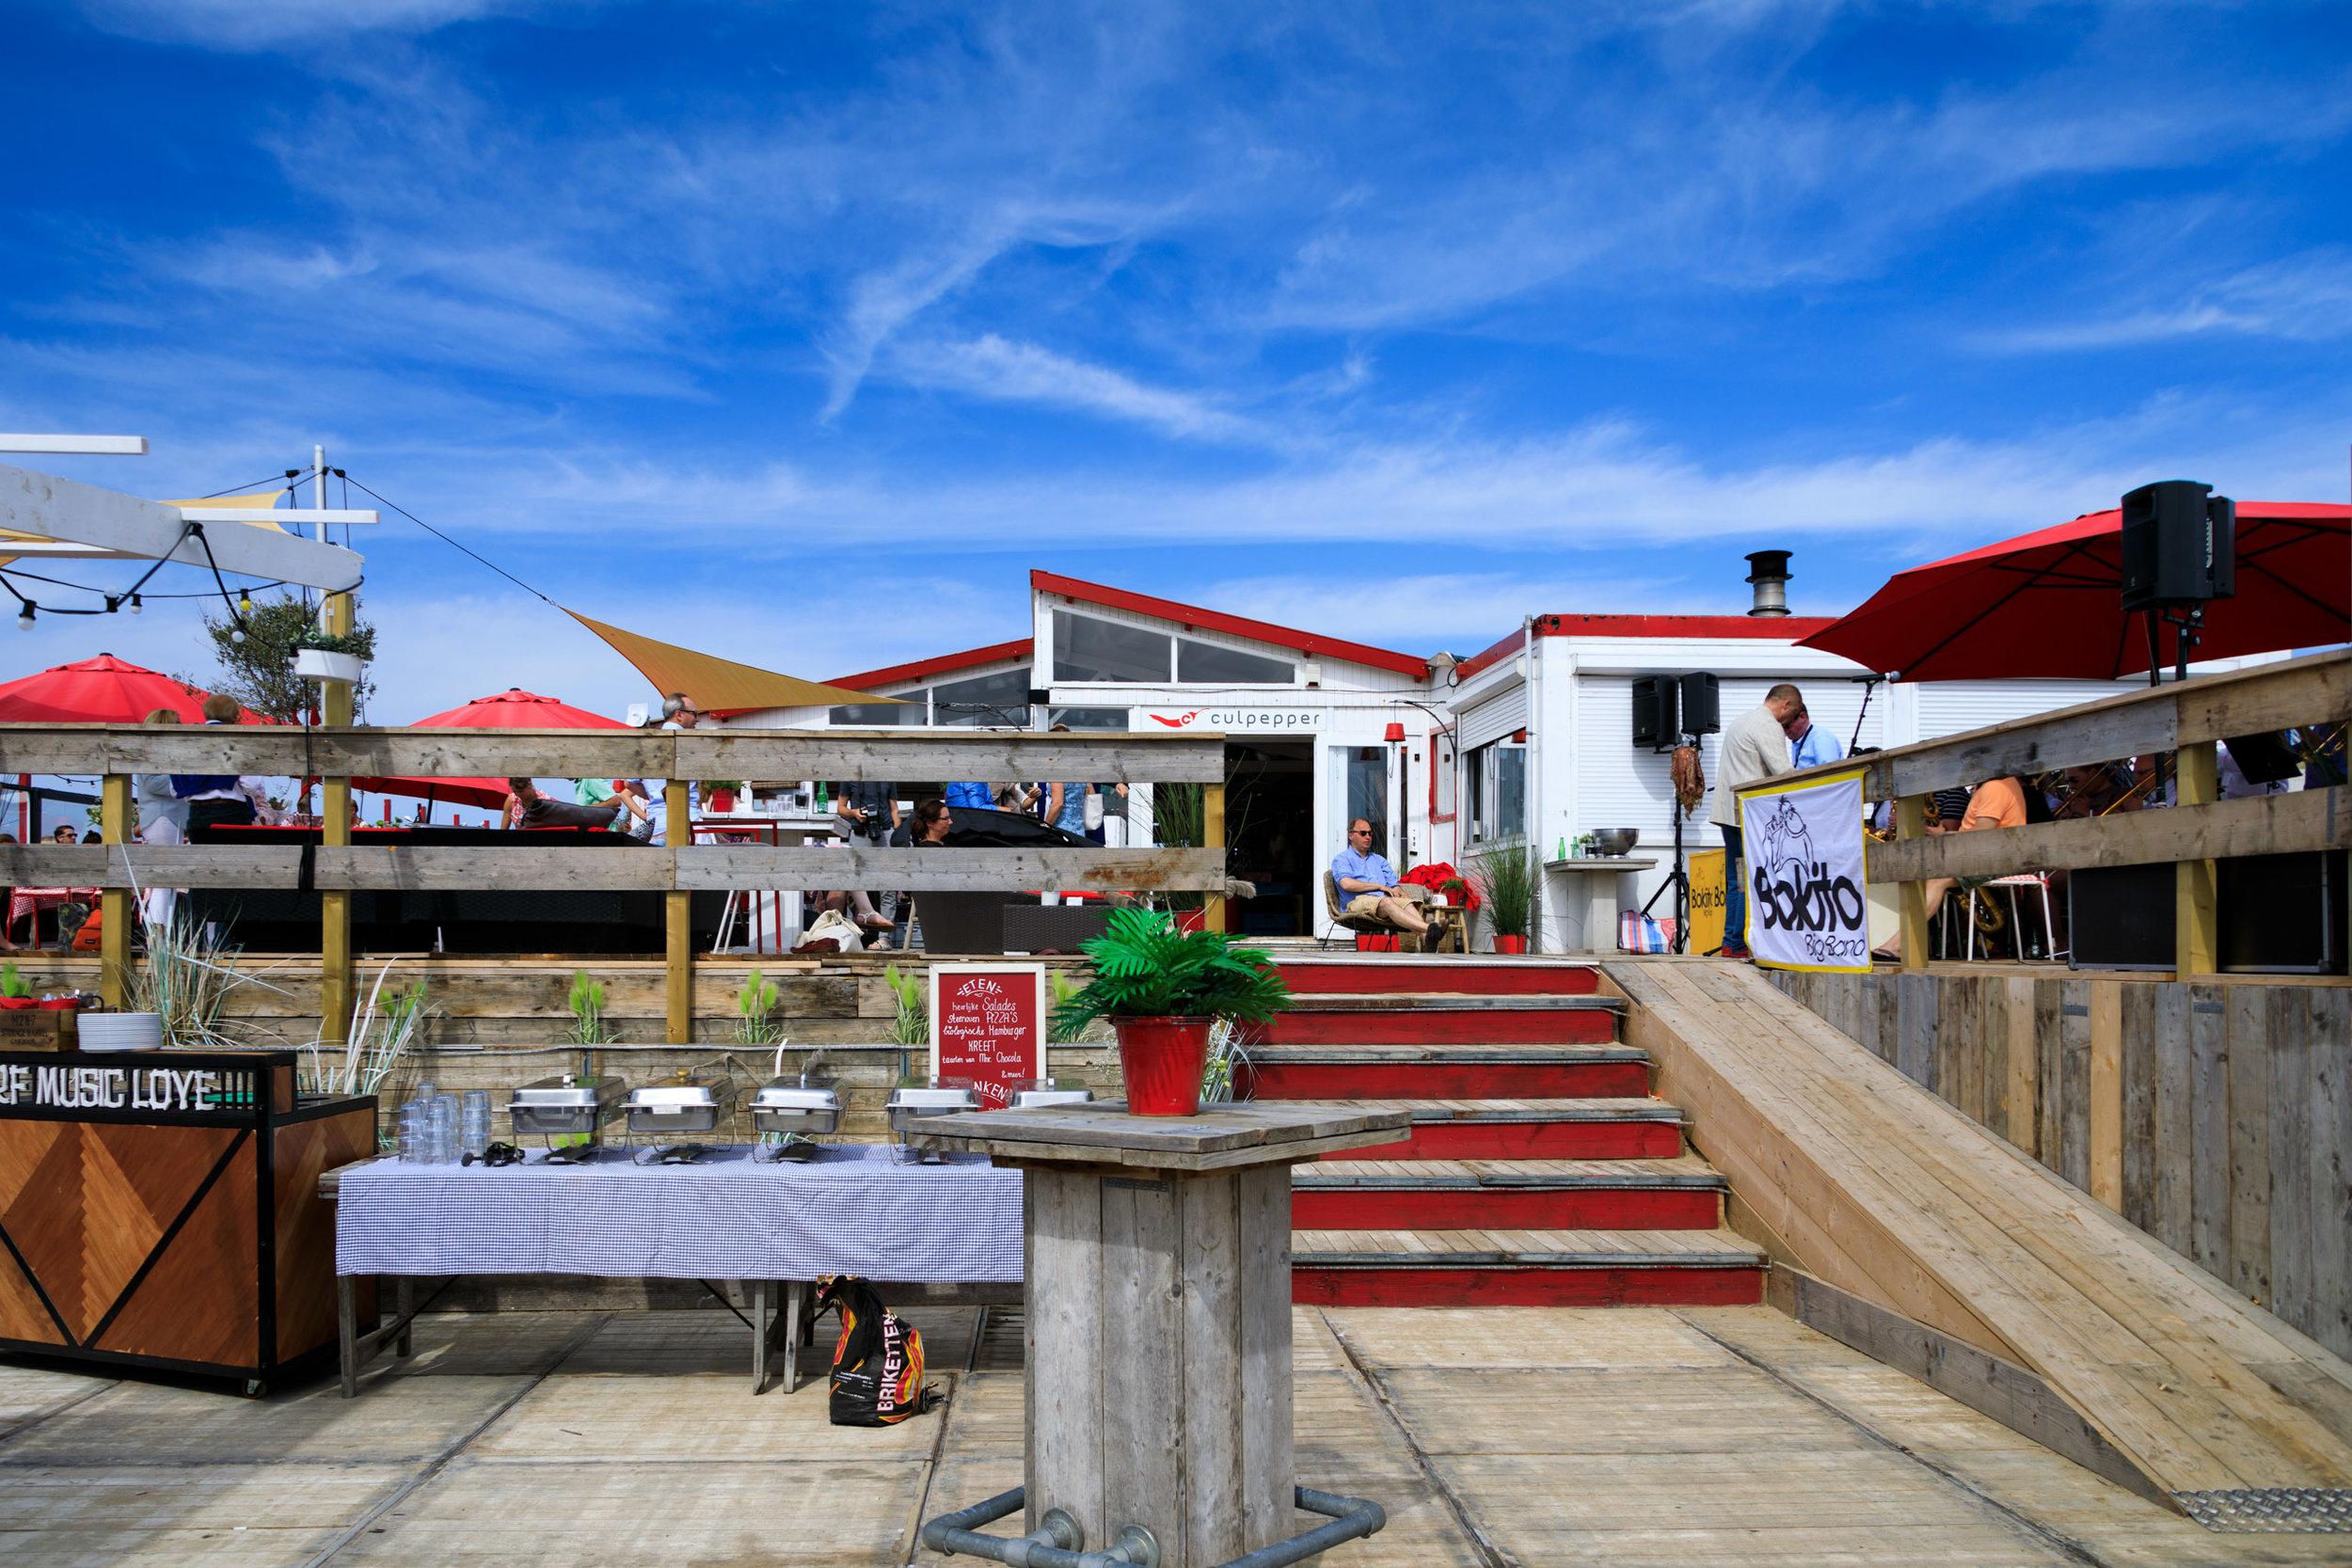 Beachclub Culpepper | Zwarte Pad Scheveningen-13.jpg